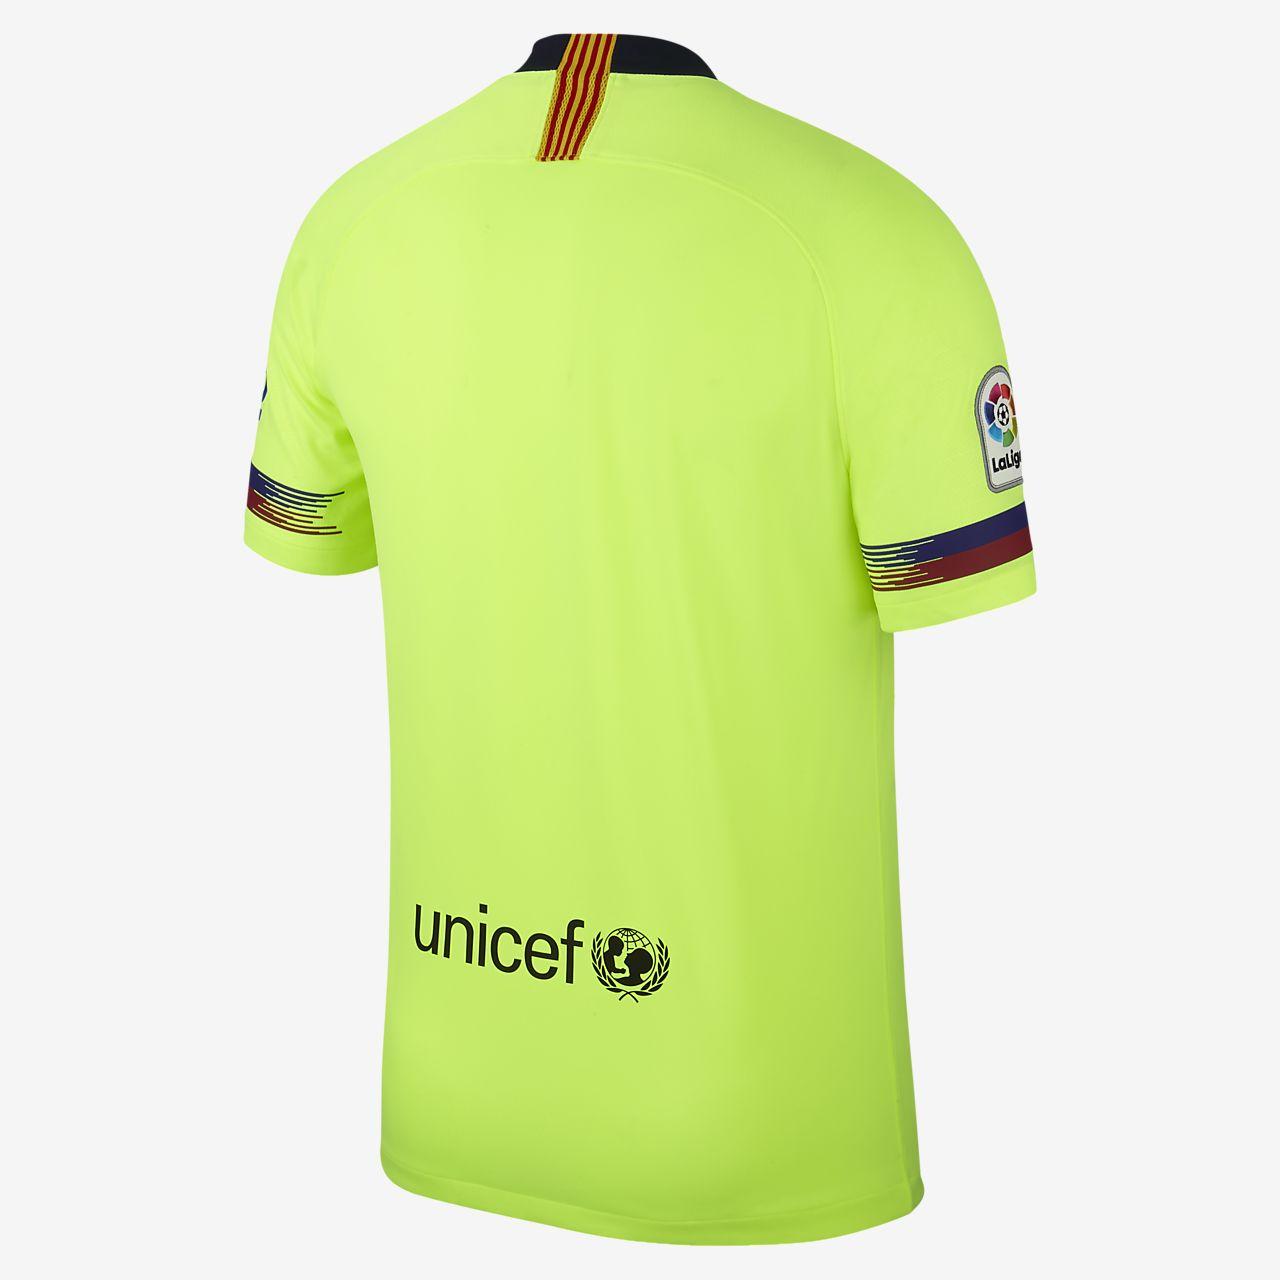 902455f07 2018 19 FC Barcelona Stadium Away Men s Football Shirt. Nike.com IN